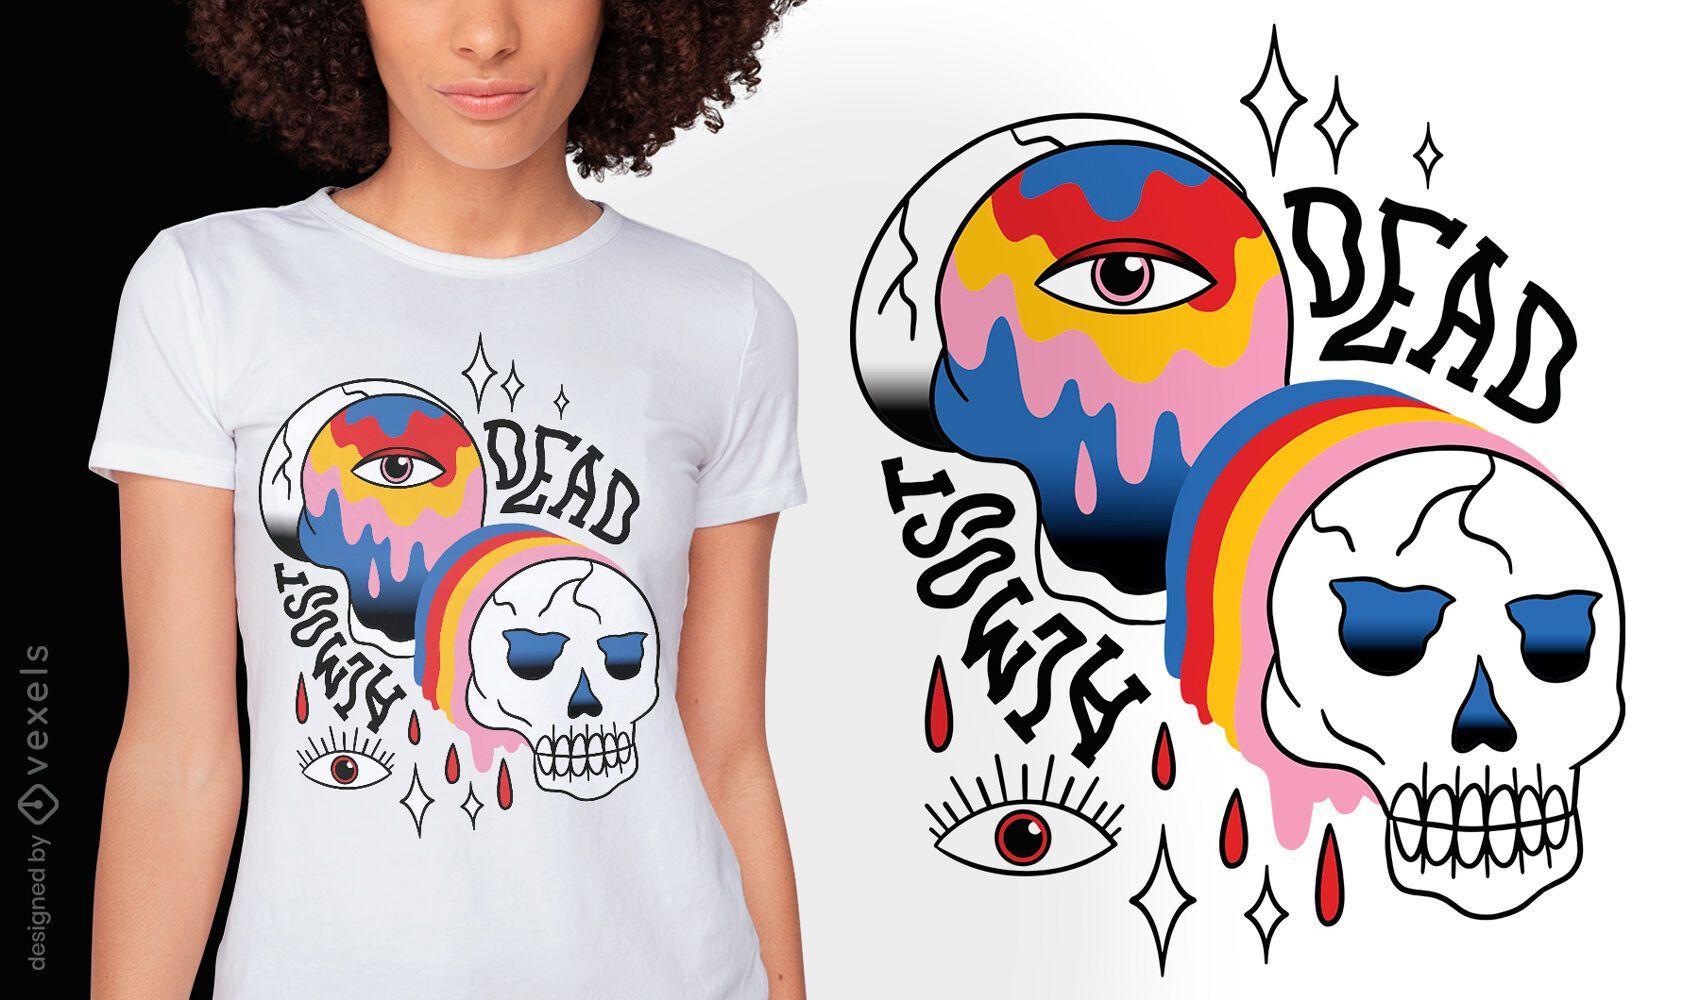 Trippy colorful skull tattoo t-shirt design